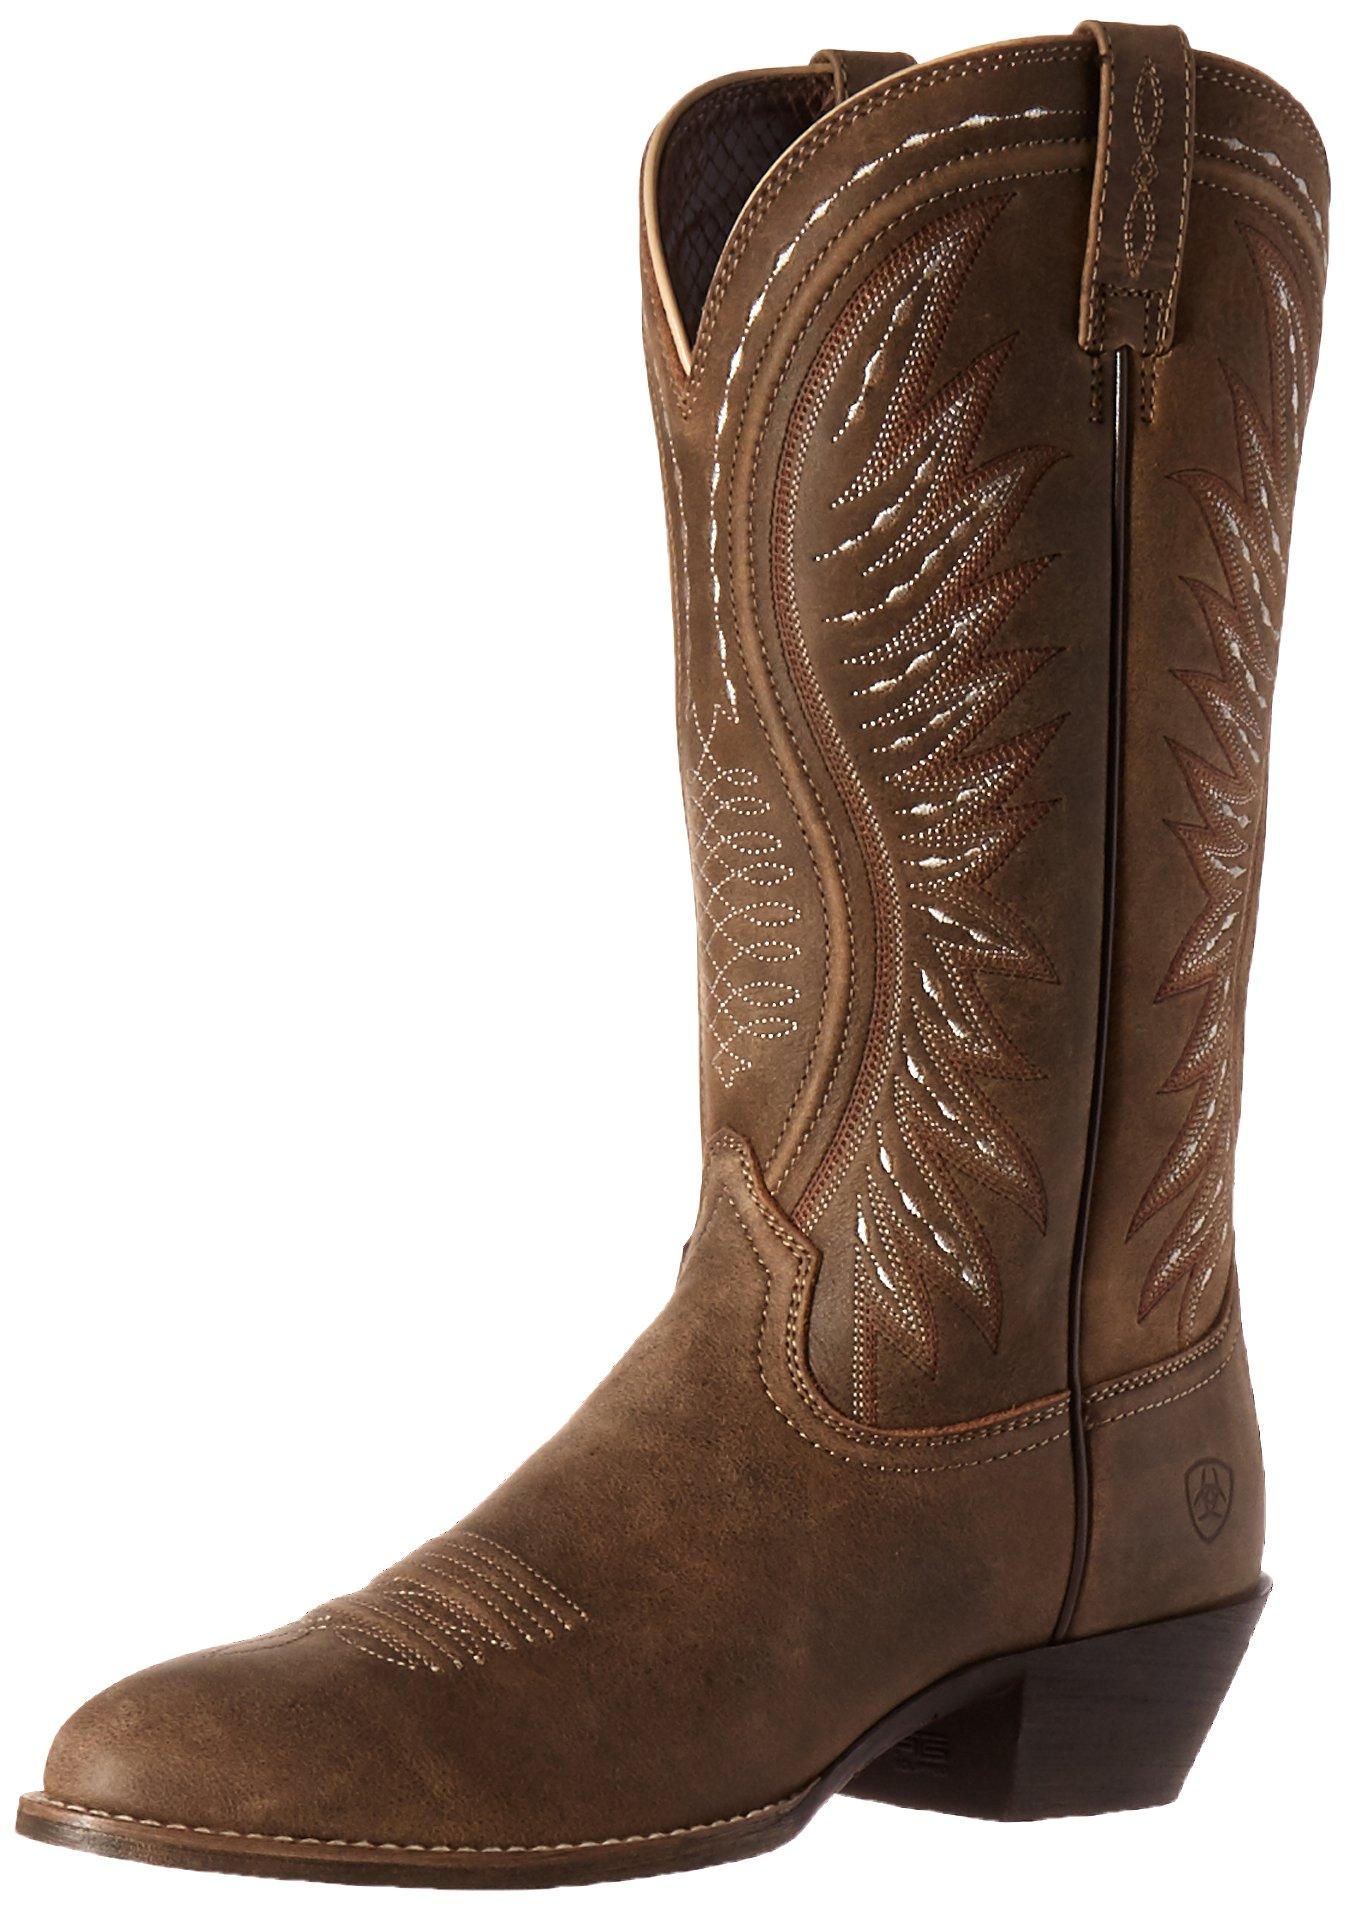 Ariat Women's Ammorette Western Cowboy Boot, Brown Bomber, 9.5 B US